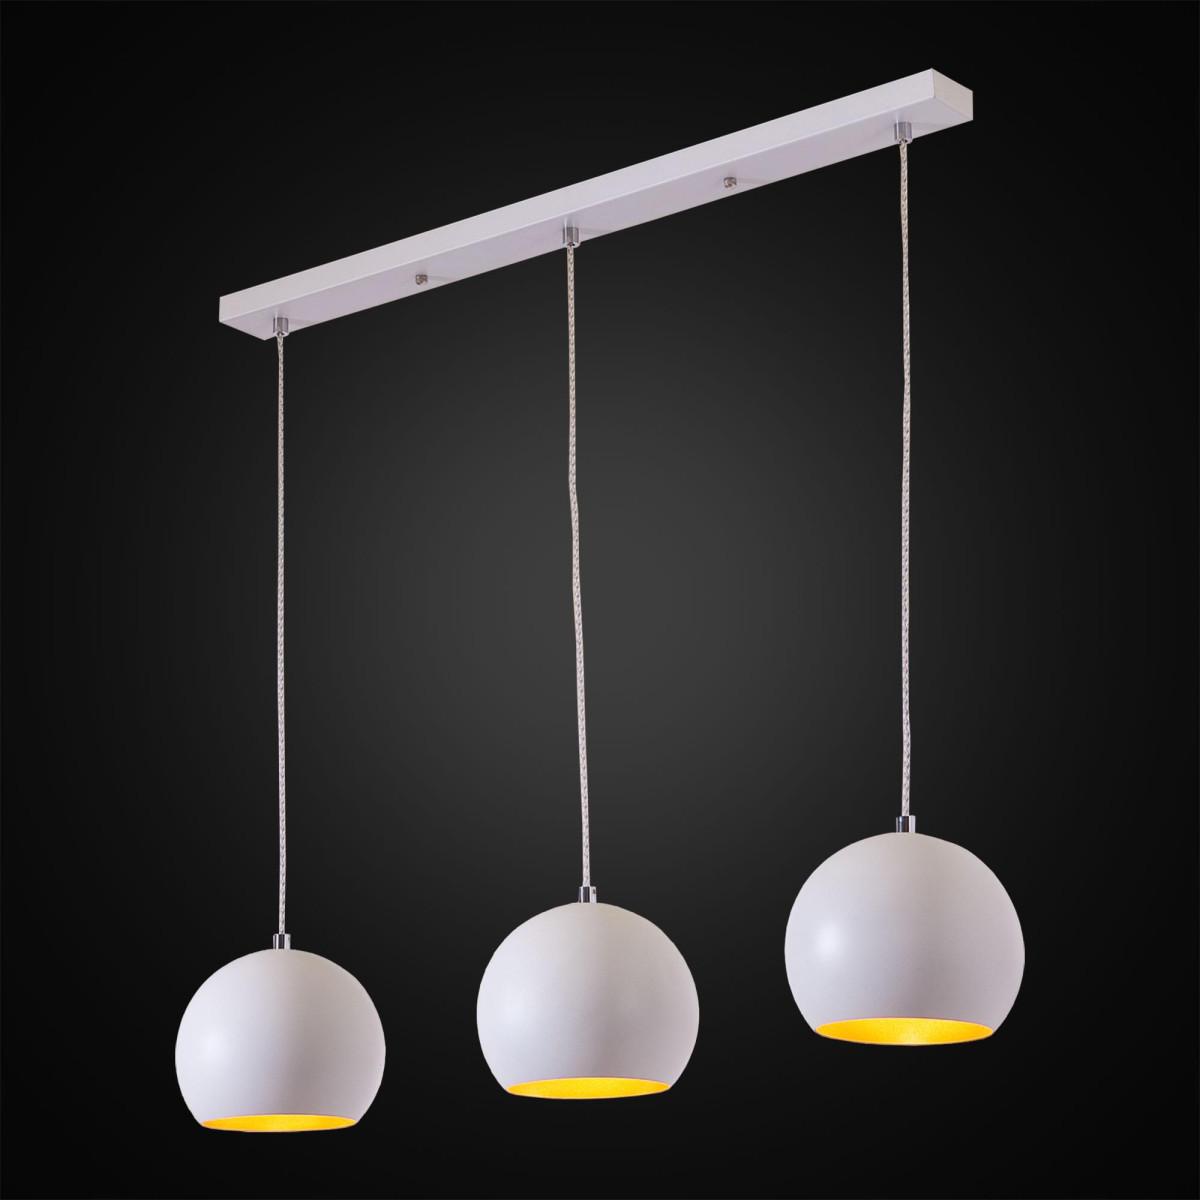 Люстра Citilux Оми Cl945130 E27 3 Лампы 9 М²